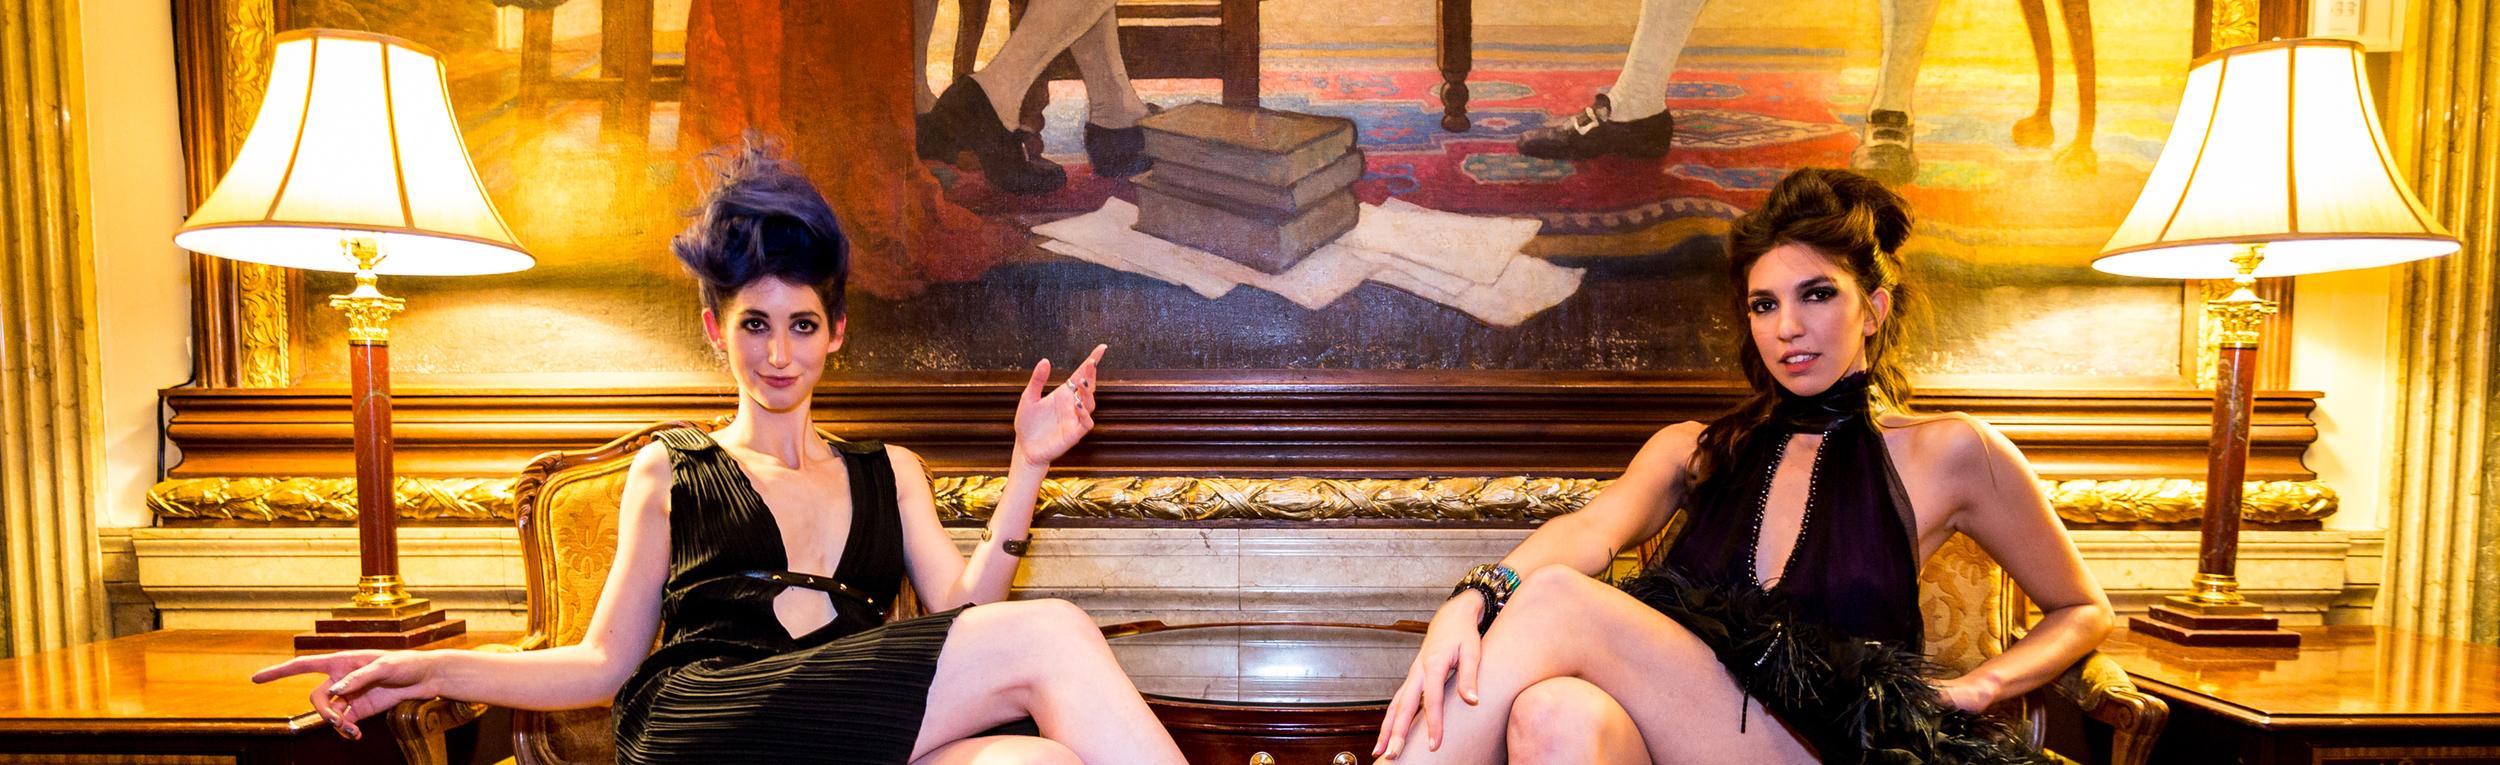 Artists Geena Matuson (@geenamatuson) and Renée Ricciardi. Image by CDA Media.